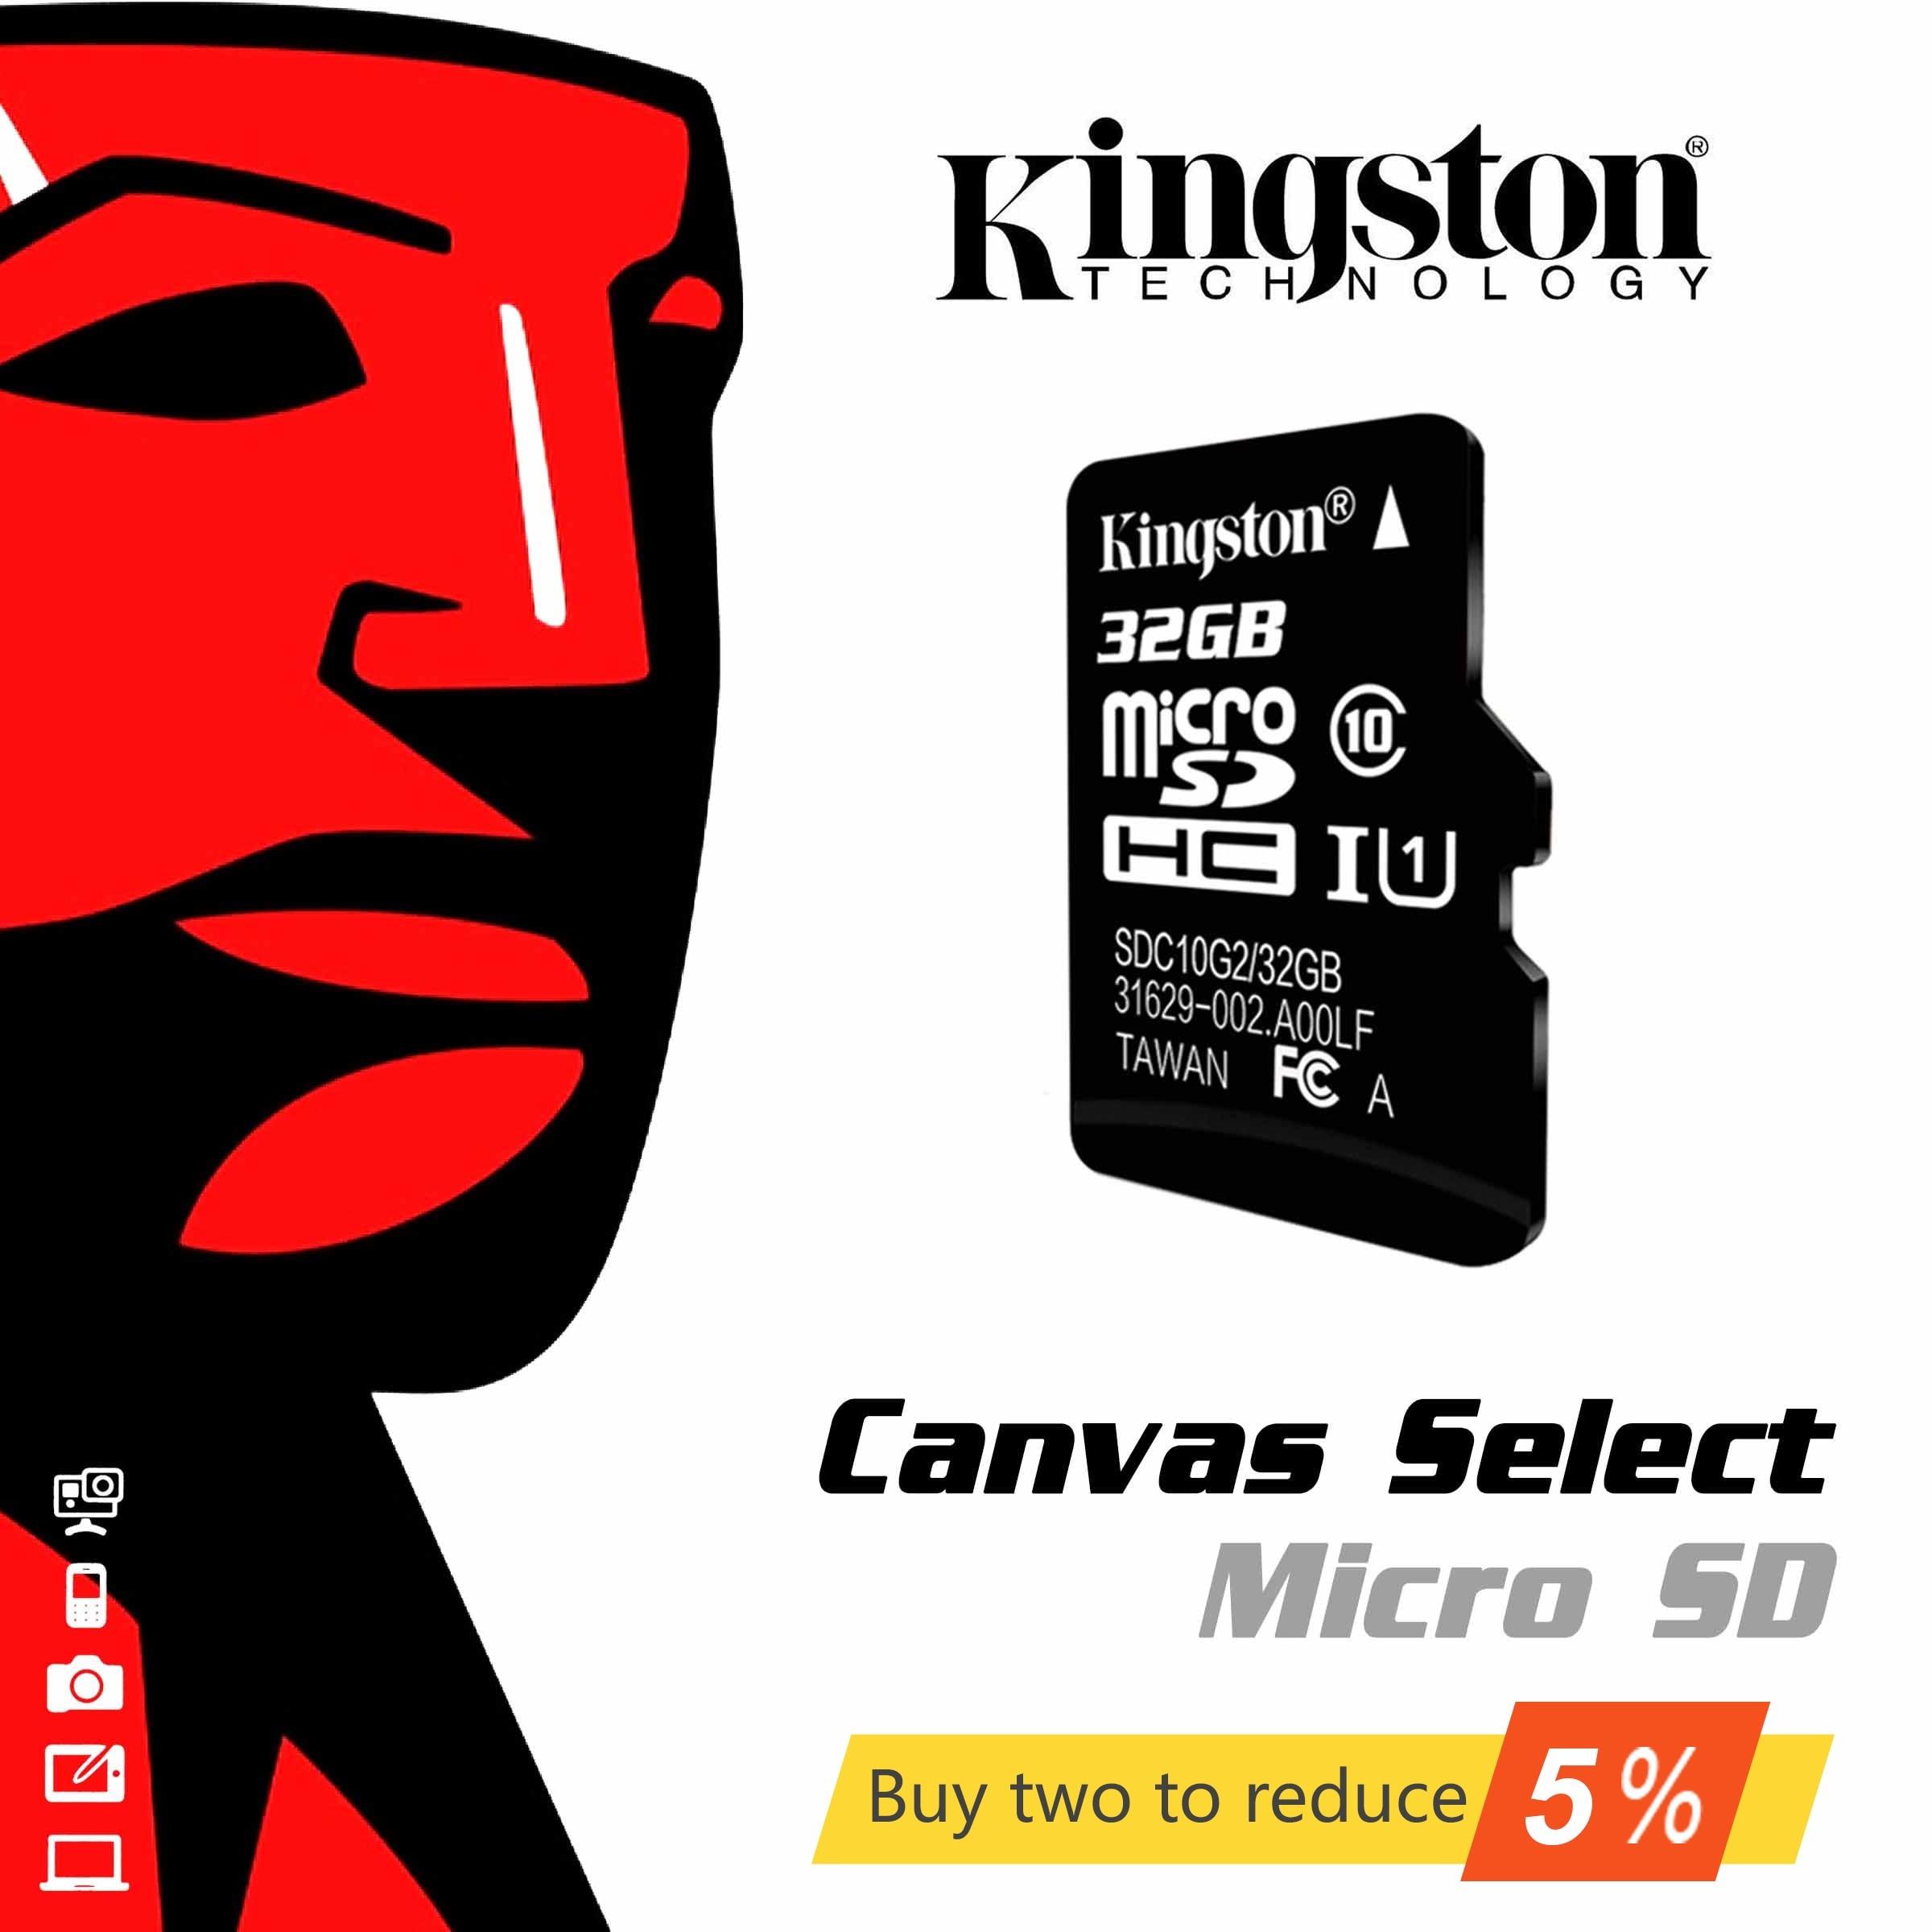 Оригинальная высокоскоростная карта памяти SDHC Kingston SD, 16 ГБ, 32 ГБ, 64 ГБ, 128 ГБ, 256 ГБ, Micro SD, класс 10, Mini TFT, 16, 32, 64, 128, 256 ГБ